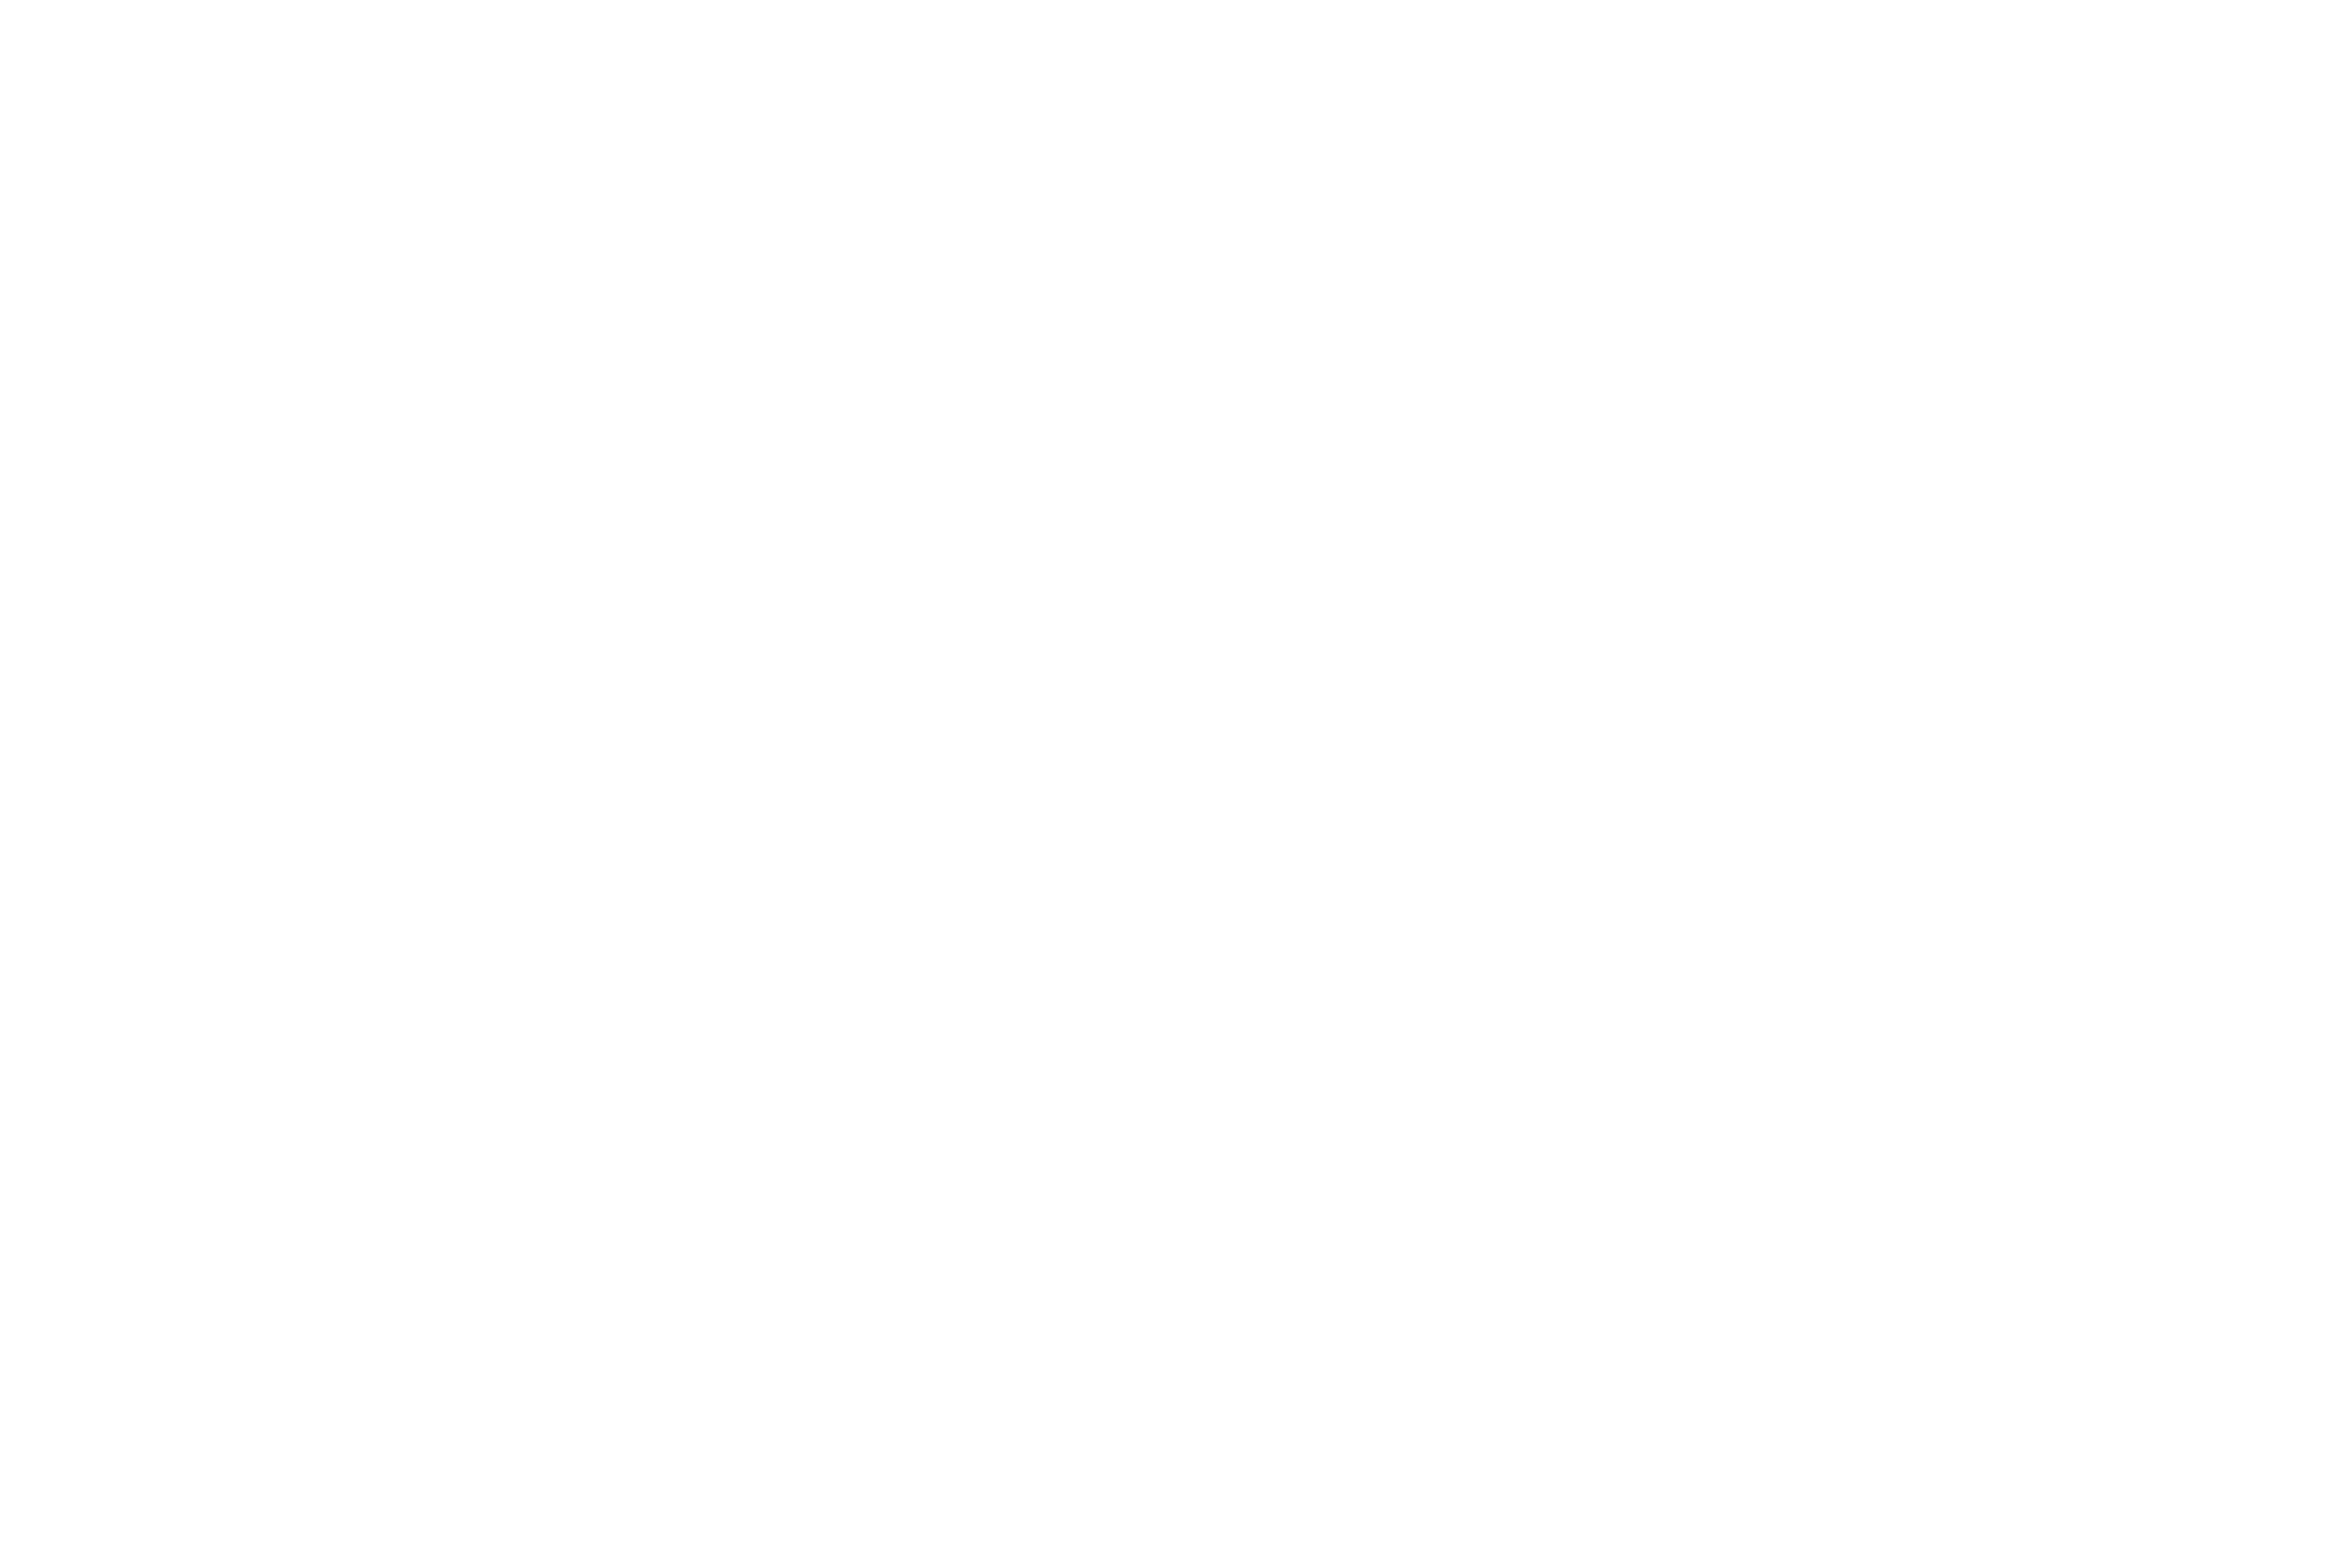 Hostaldonamanuela